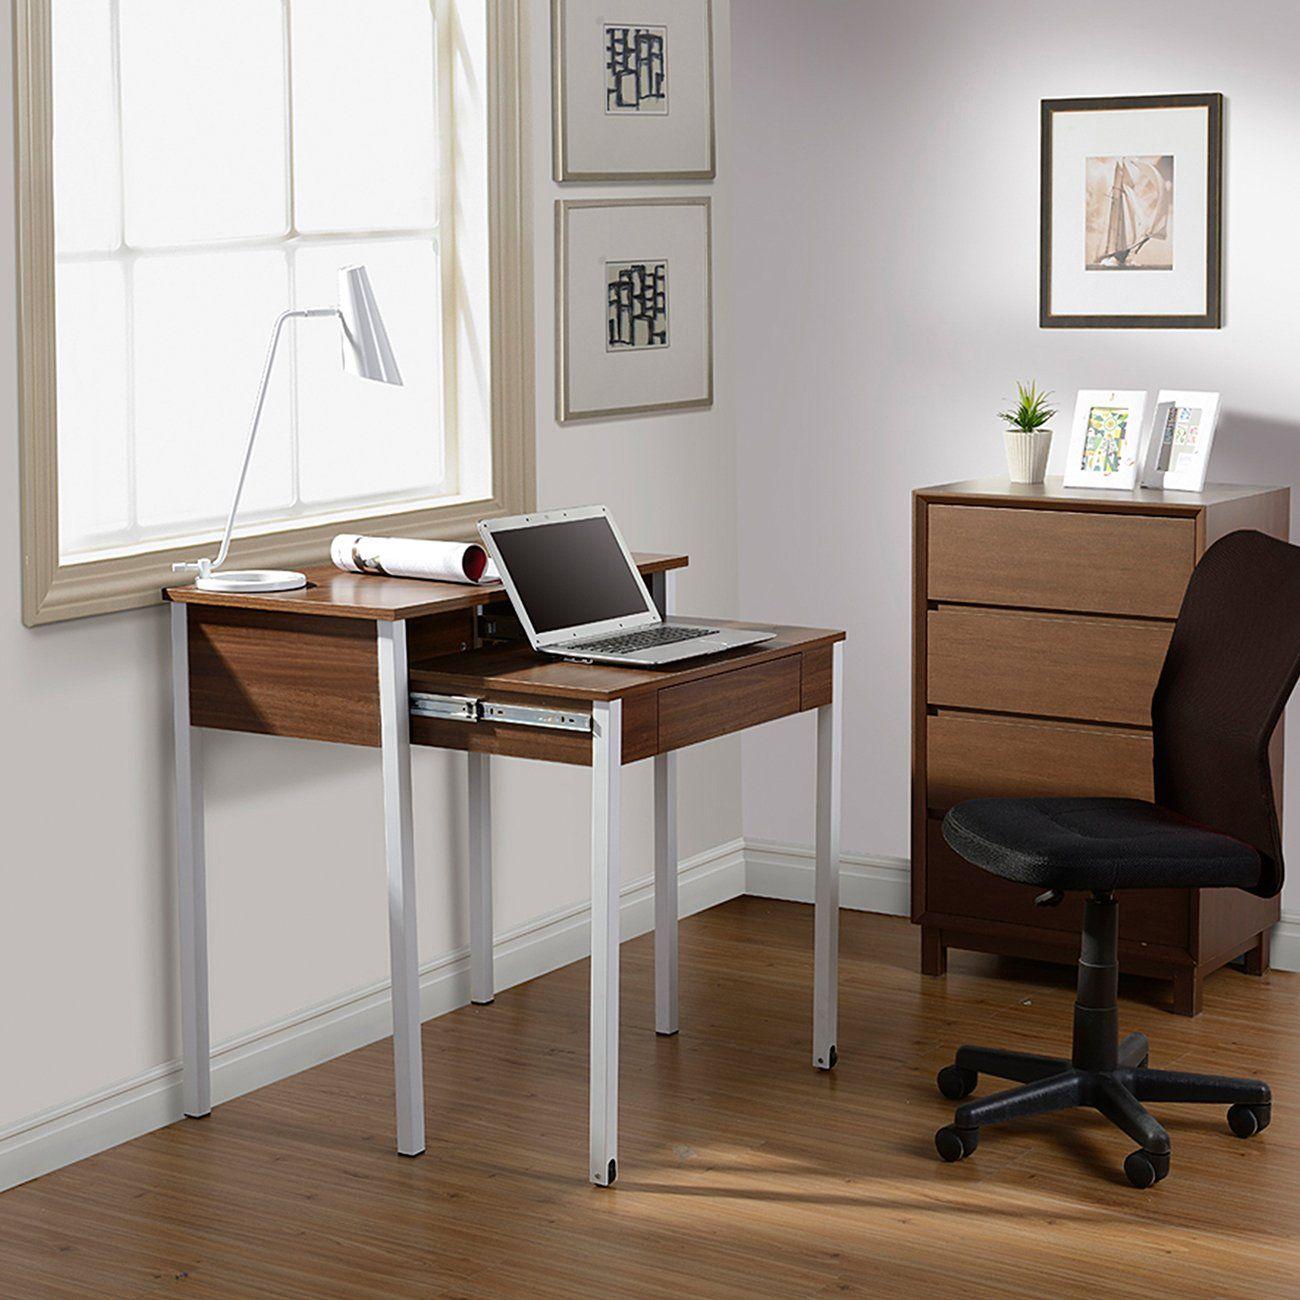 Techni Mobili Retractable 1 Drawer Writing Deskbrown In 2021 Student Desks Furniture Space Saving